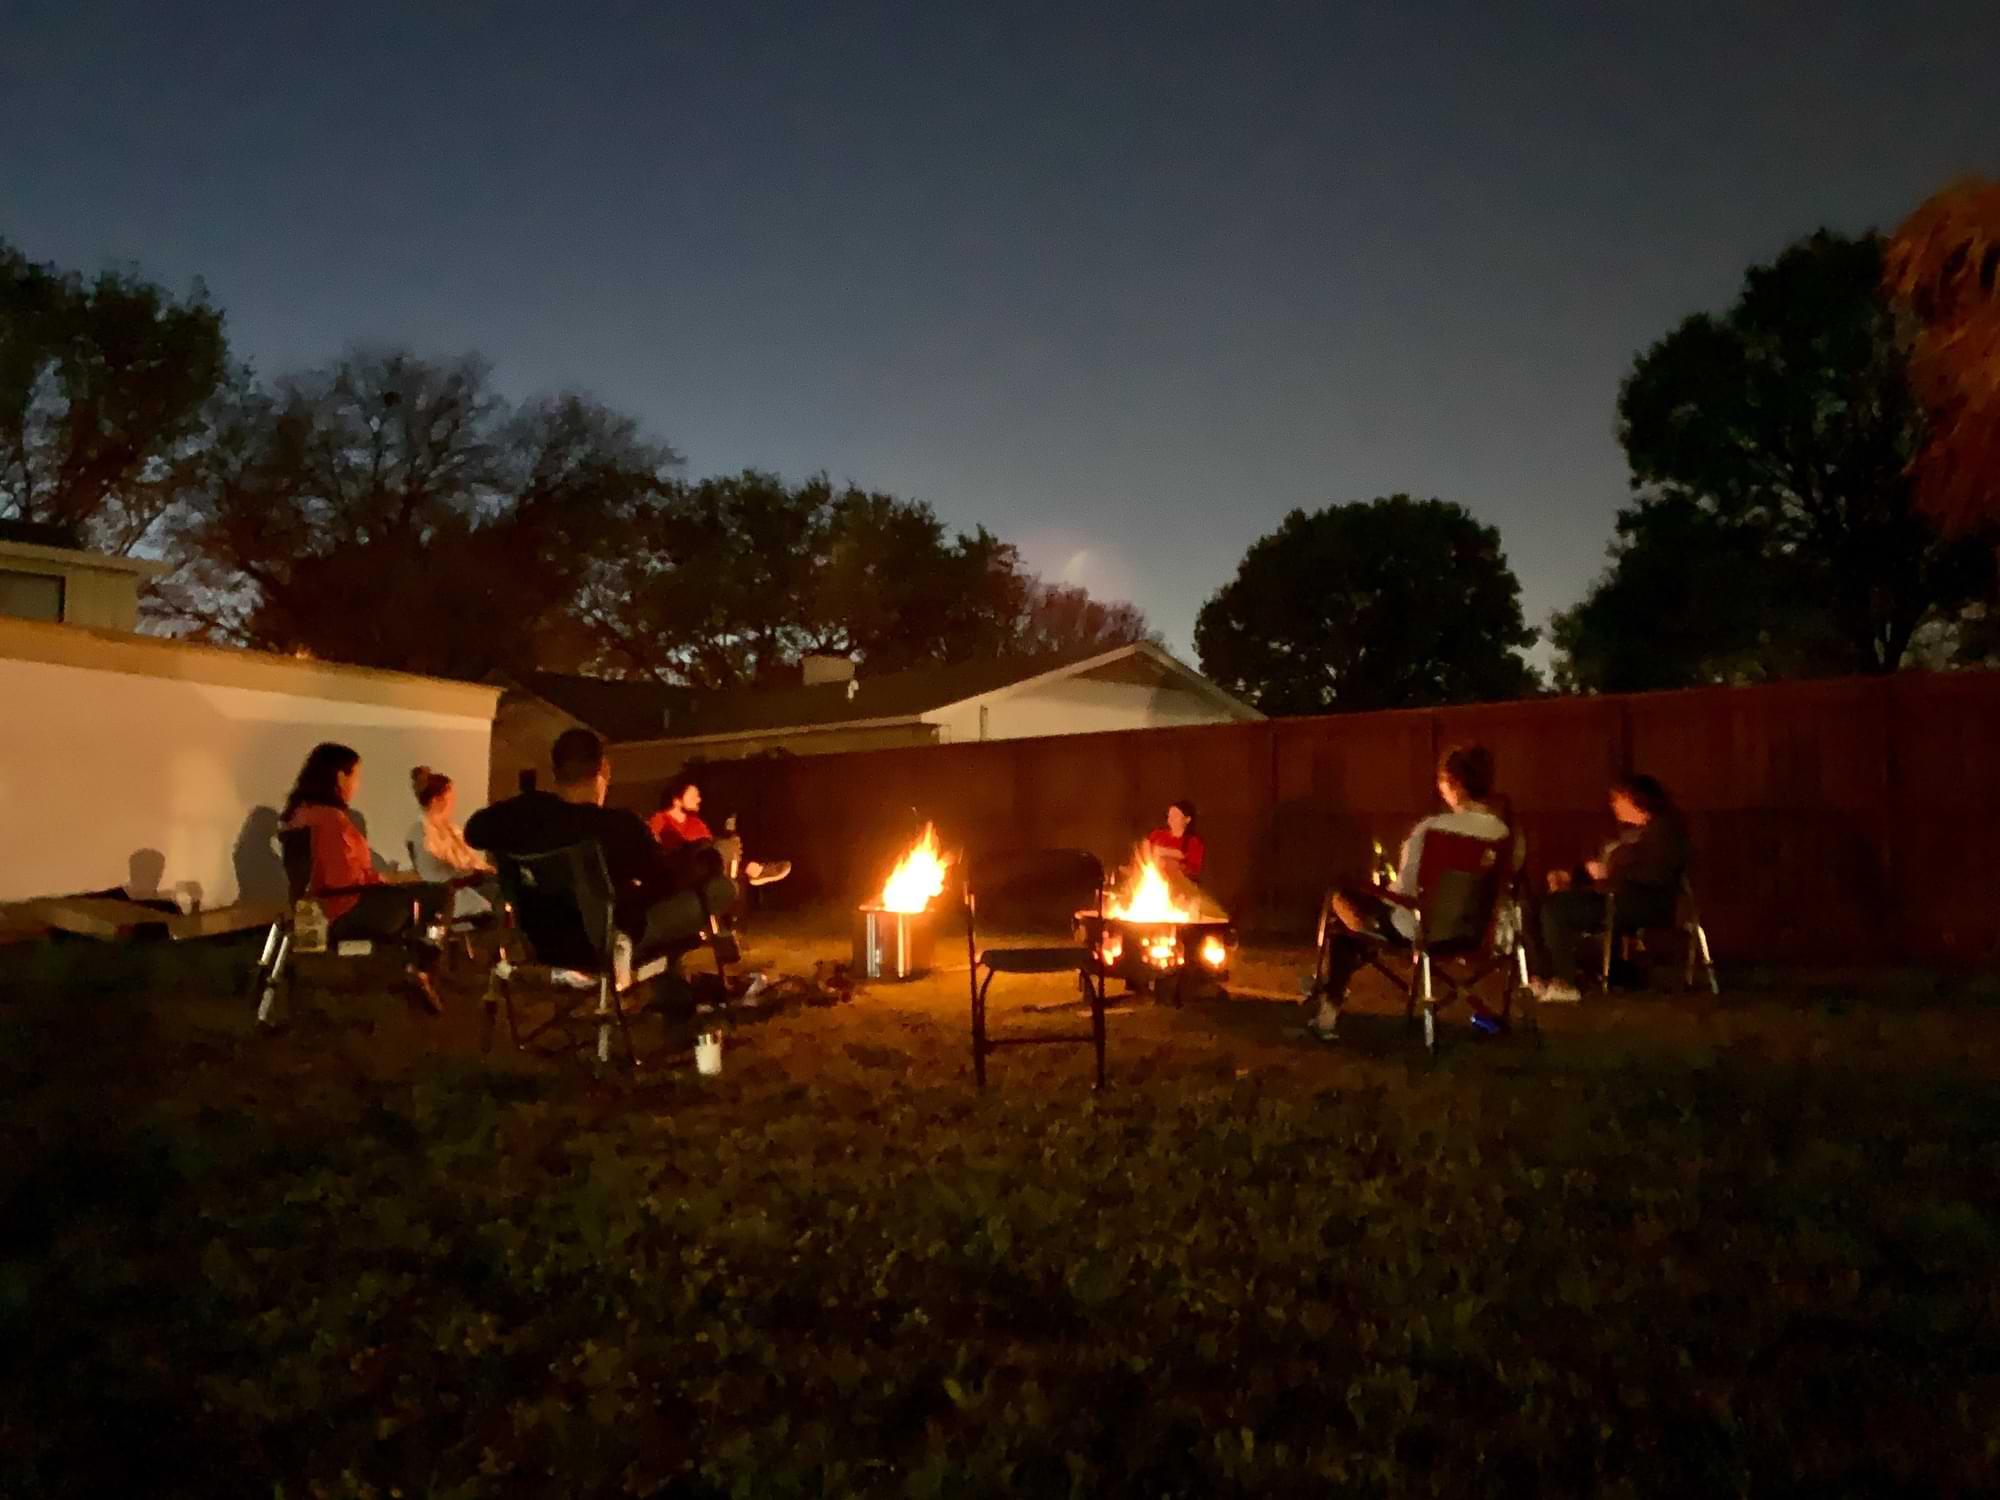 David and friends sitting around a campfire